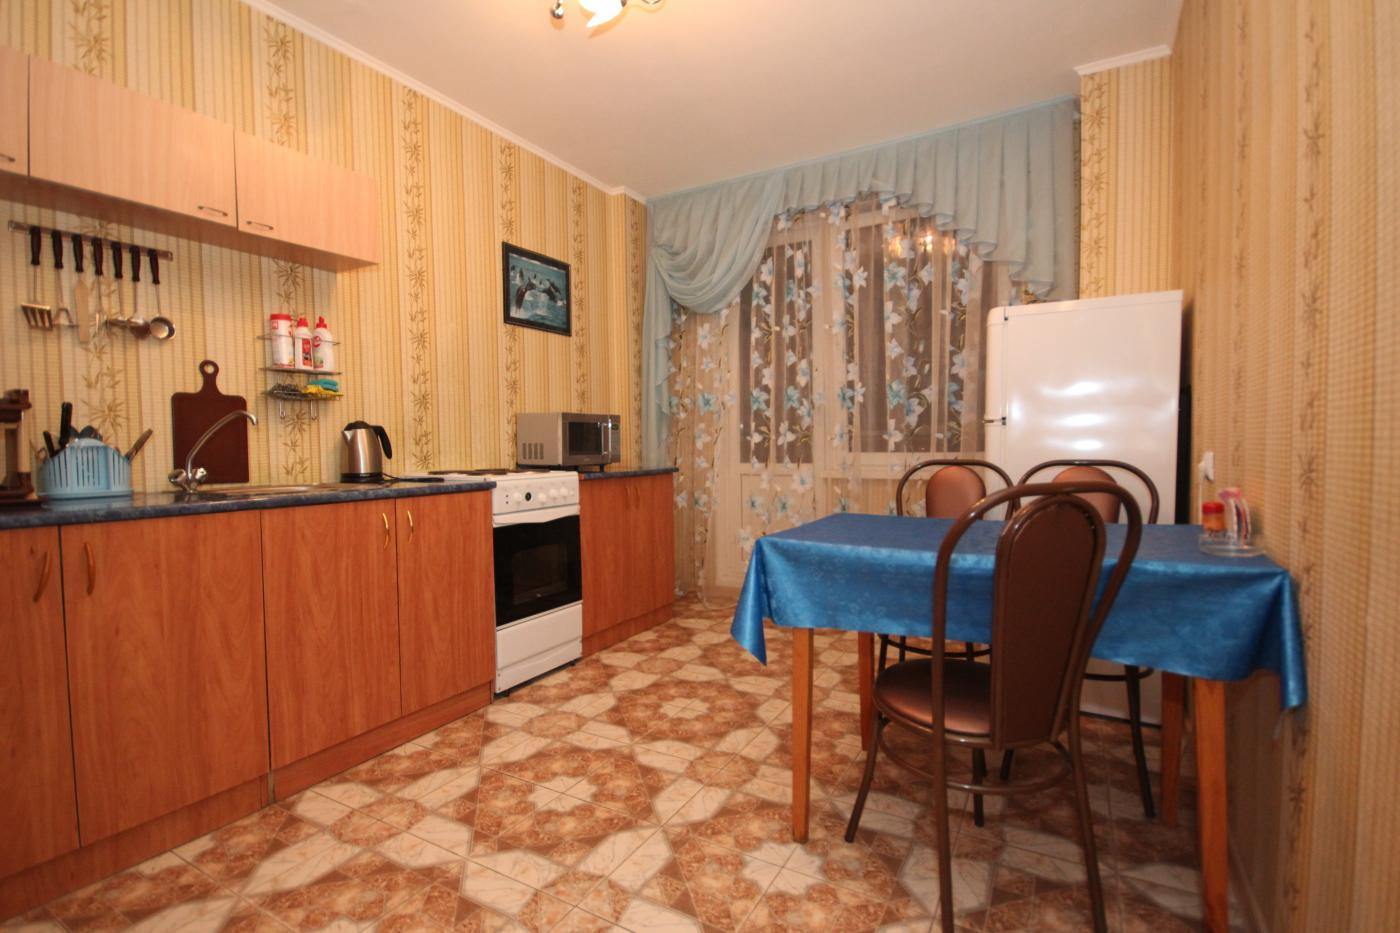 1-комнатная квартира посуточно (вариант № 1749), ул. Победы бульвар, фото № 5